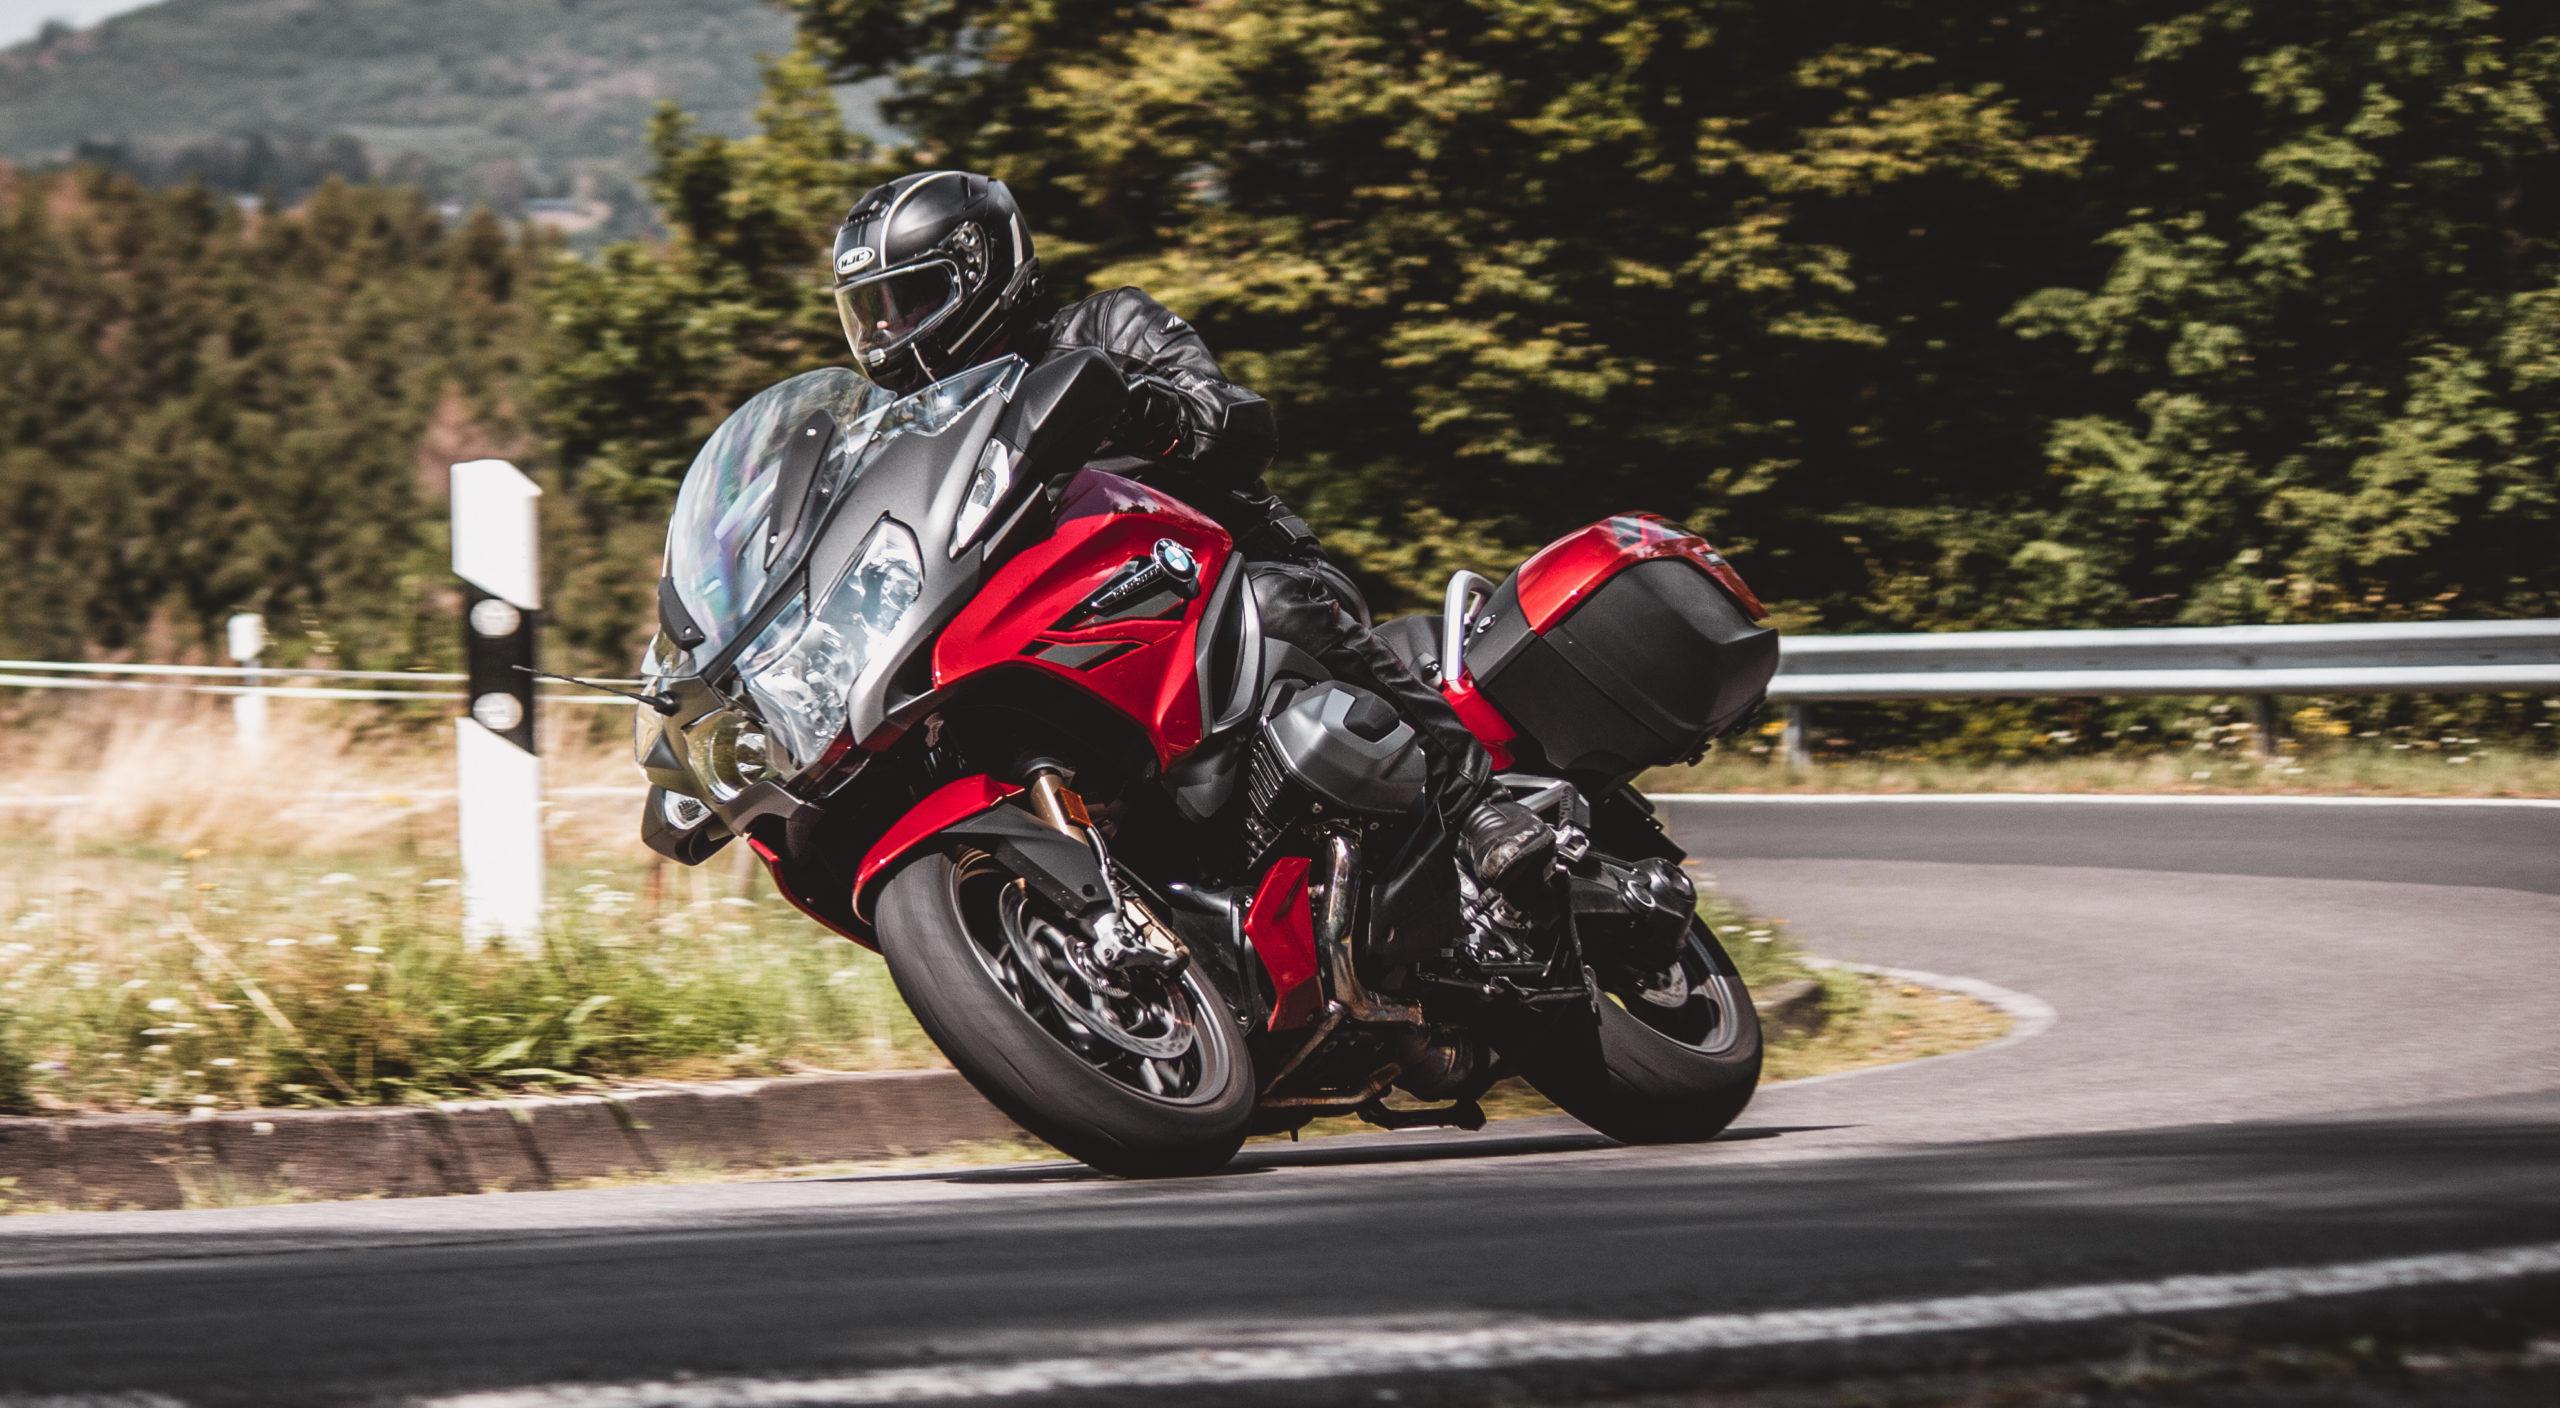 Motorrad BMW R1250RT 20:11